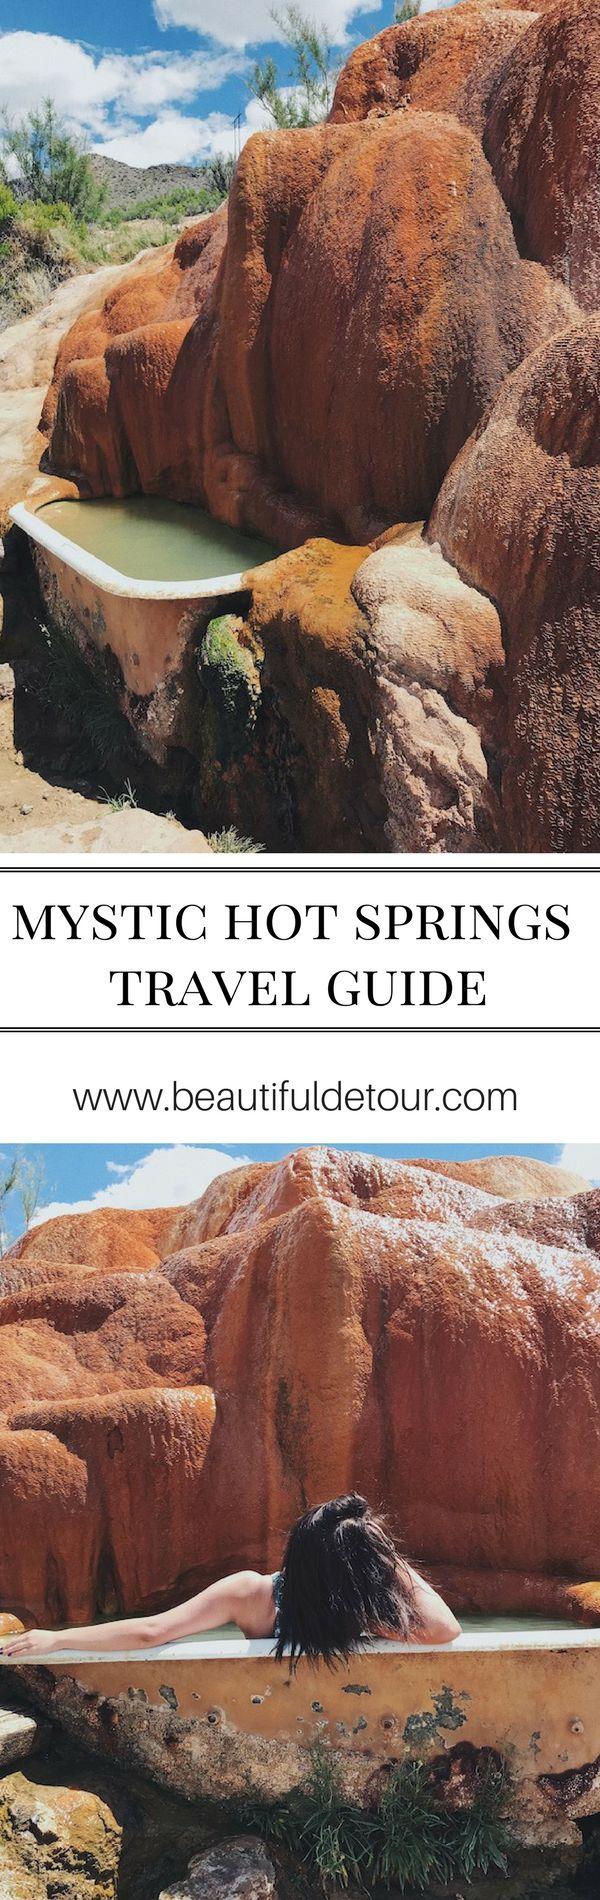 MYSTIC HOT SPRINGS TRAVEL GUIDE